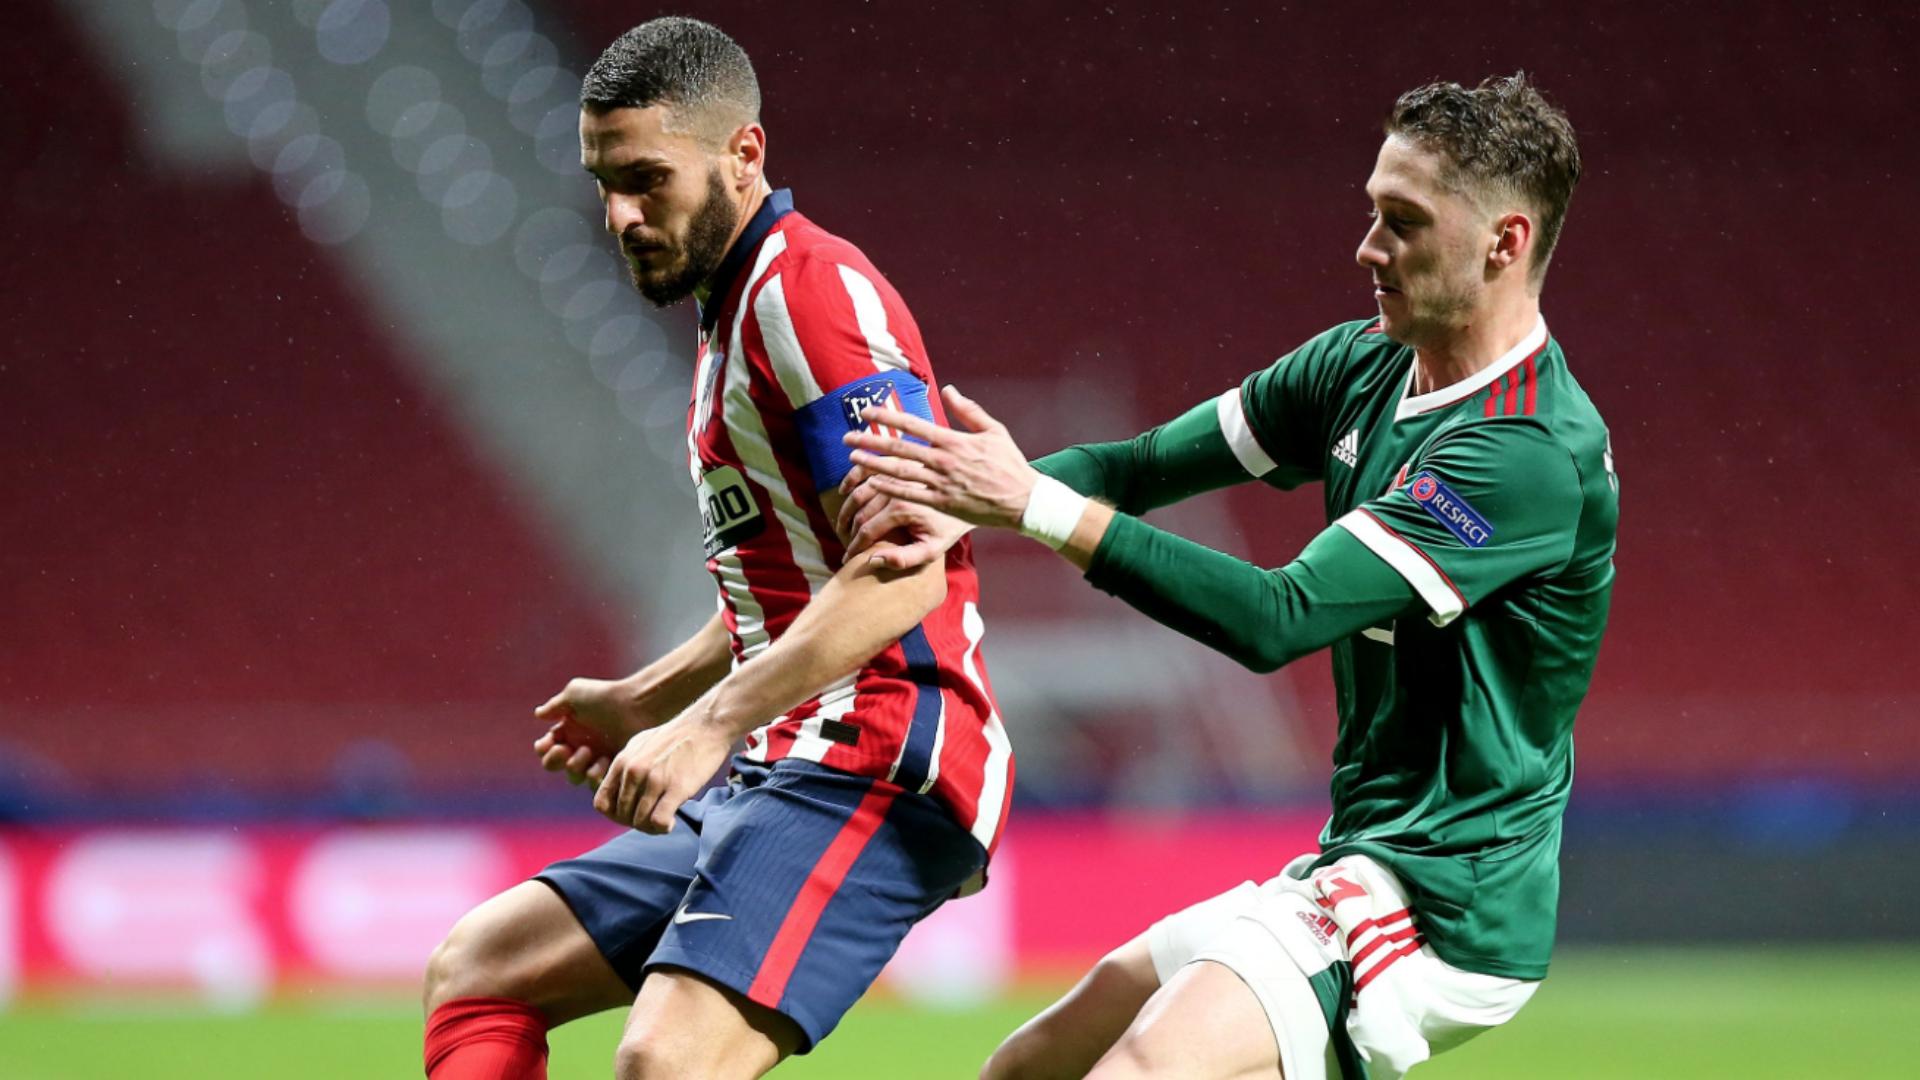 Atletico Madrid 0-0 Lokomotiv Moscow: VAR denies Koke as Simeone's men are held